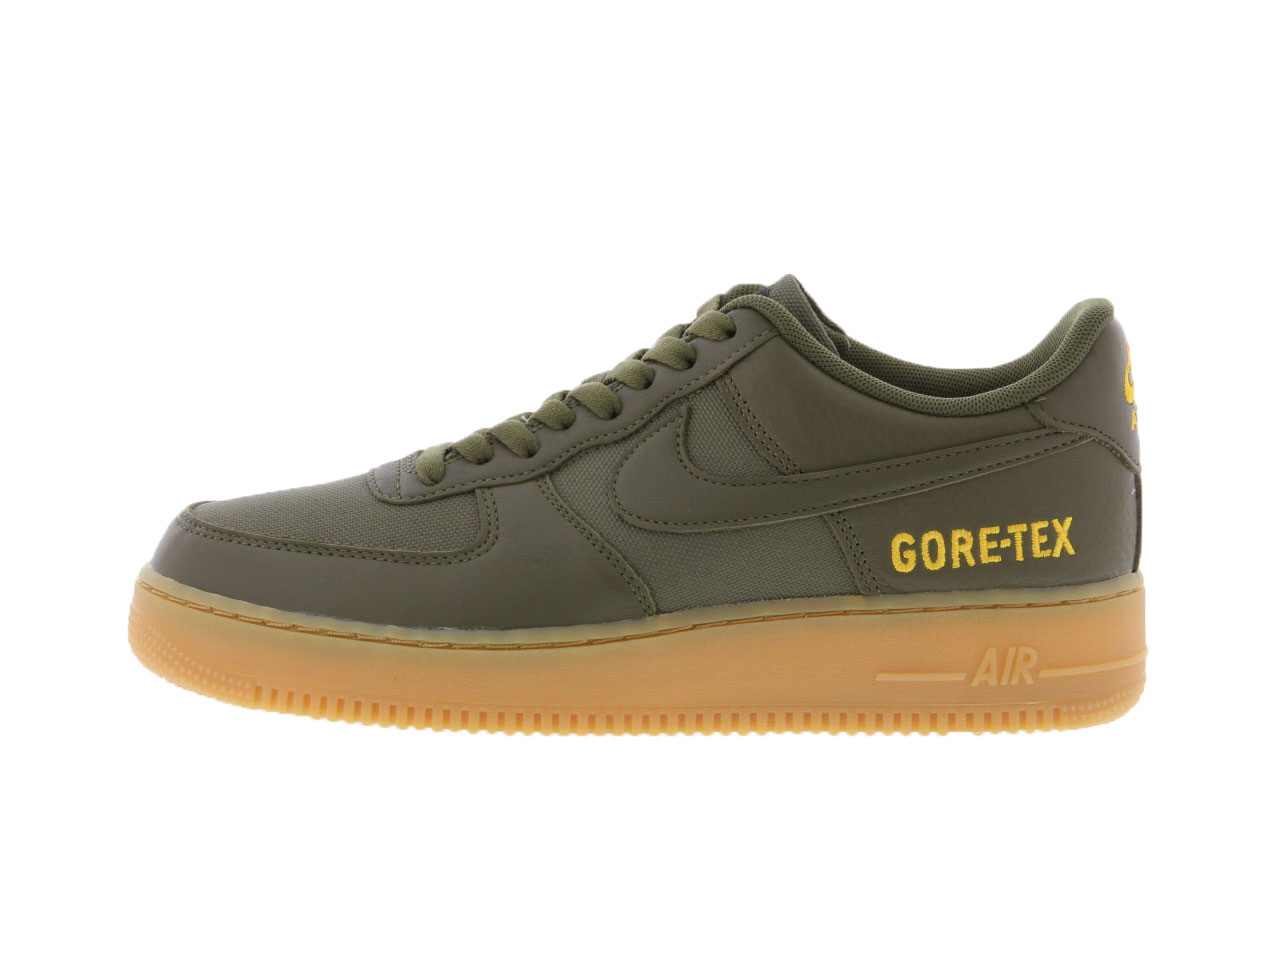 NIKE AIR FORCE 1 GTX(CK2630-200)【ナイキ エアフォース1 ゴアテックス】【メンズファッション】【シューズ】【スニーカー】【靴】【フットウェア】